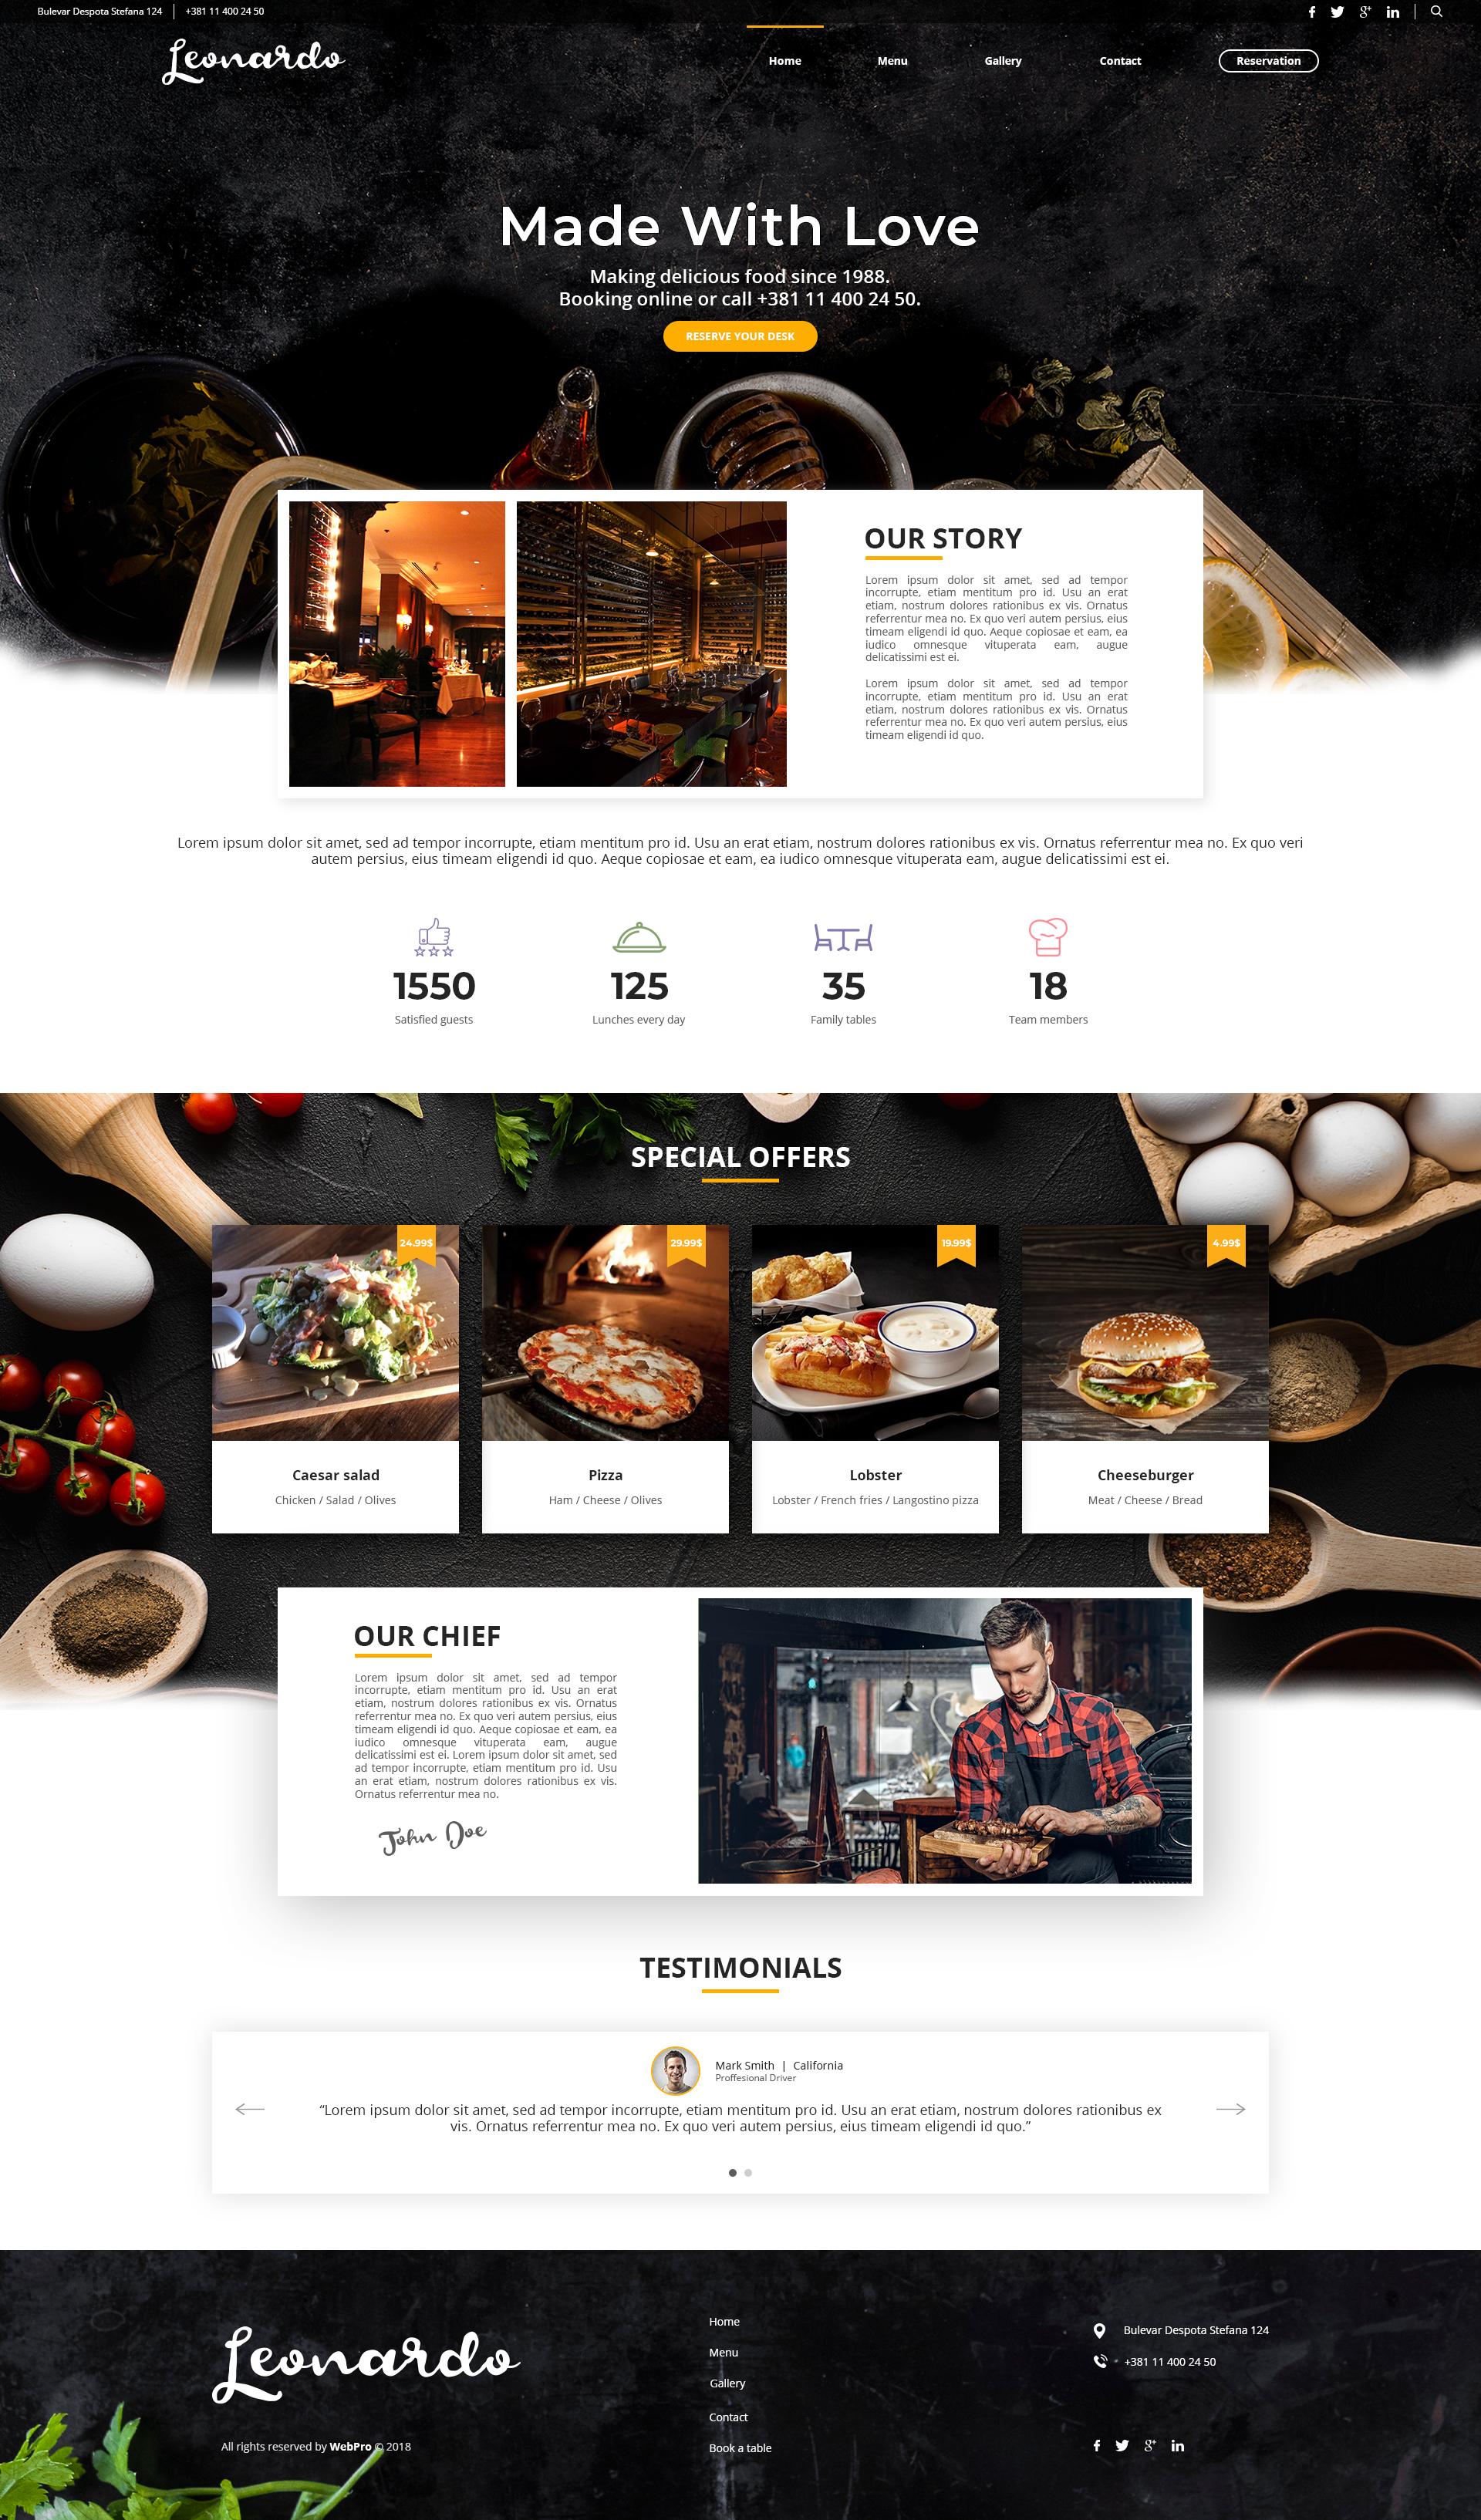 Restaurant Website Restaurant Website Design Food Website Design Food Web Design